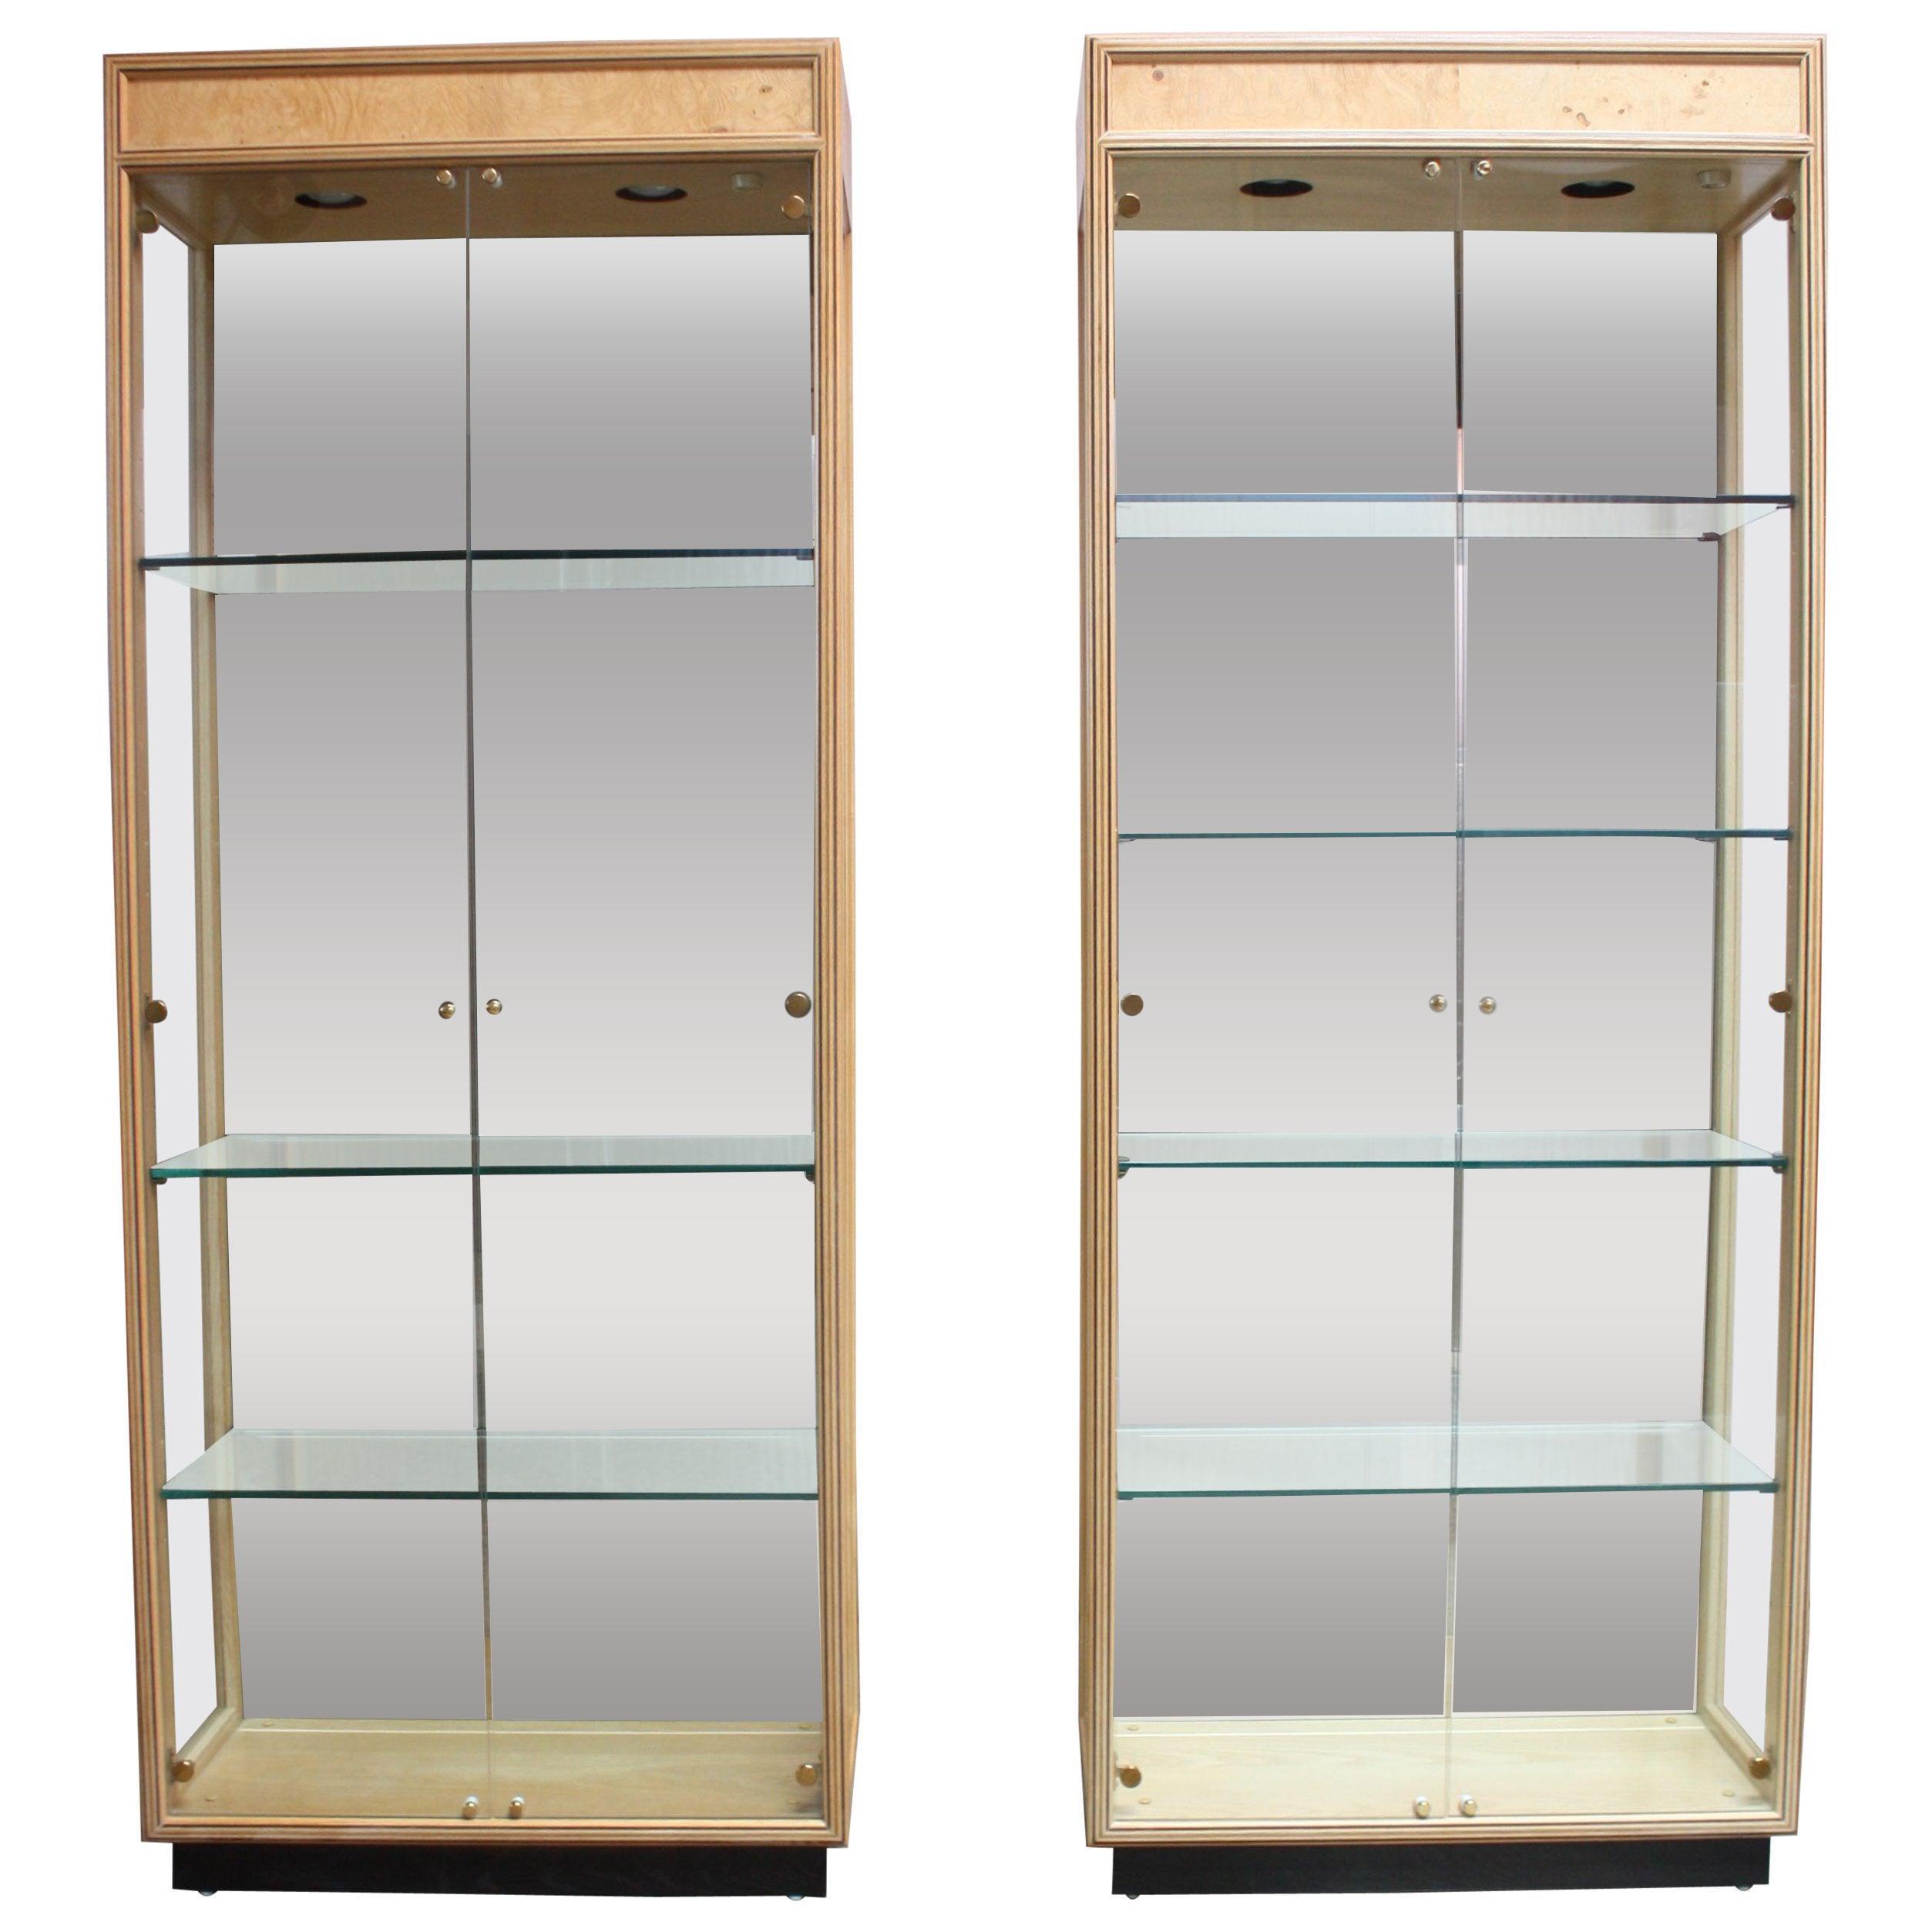 Pair of Vintage Henredon Illuminated Display Cabinets in Olive Burl